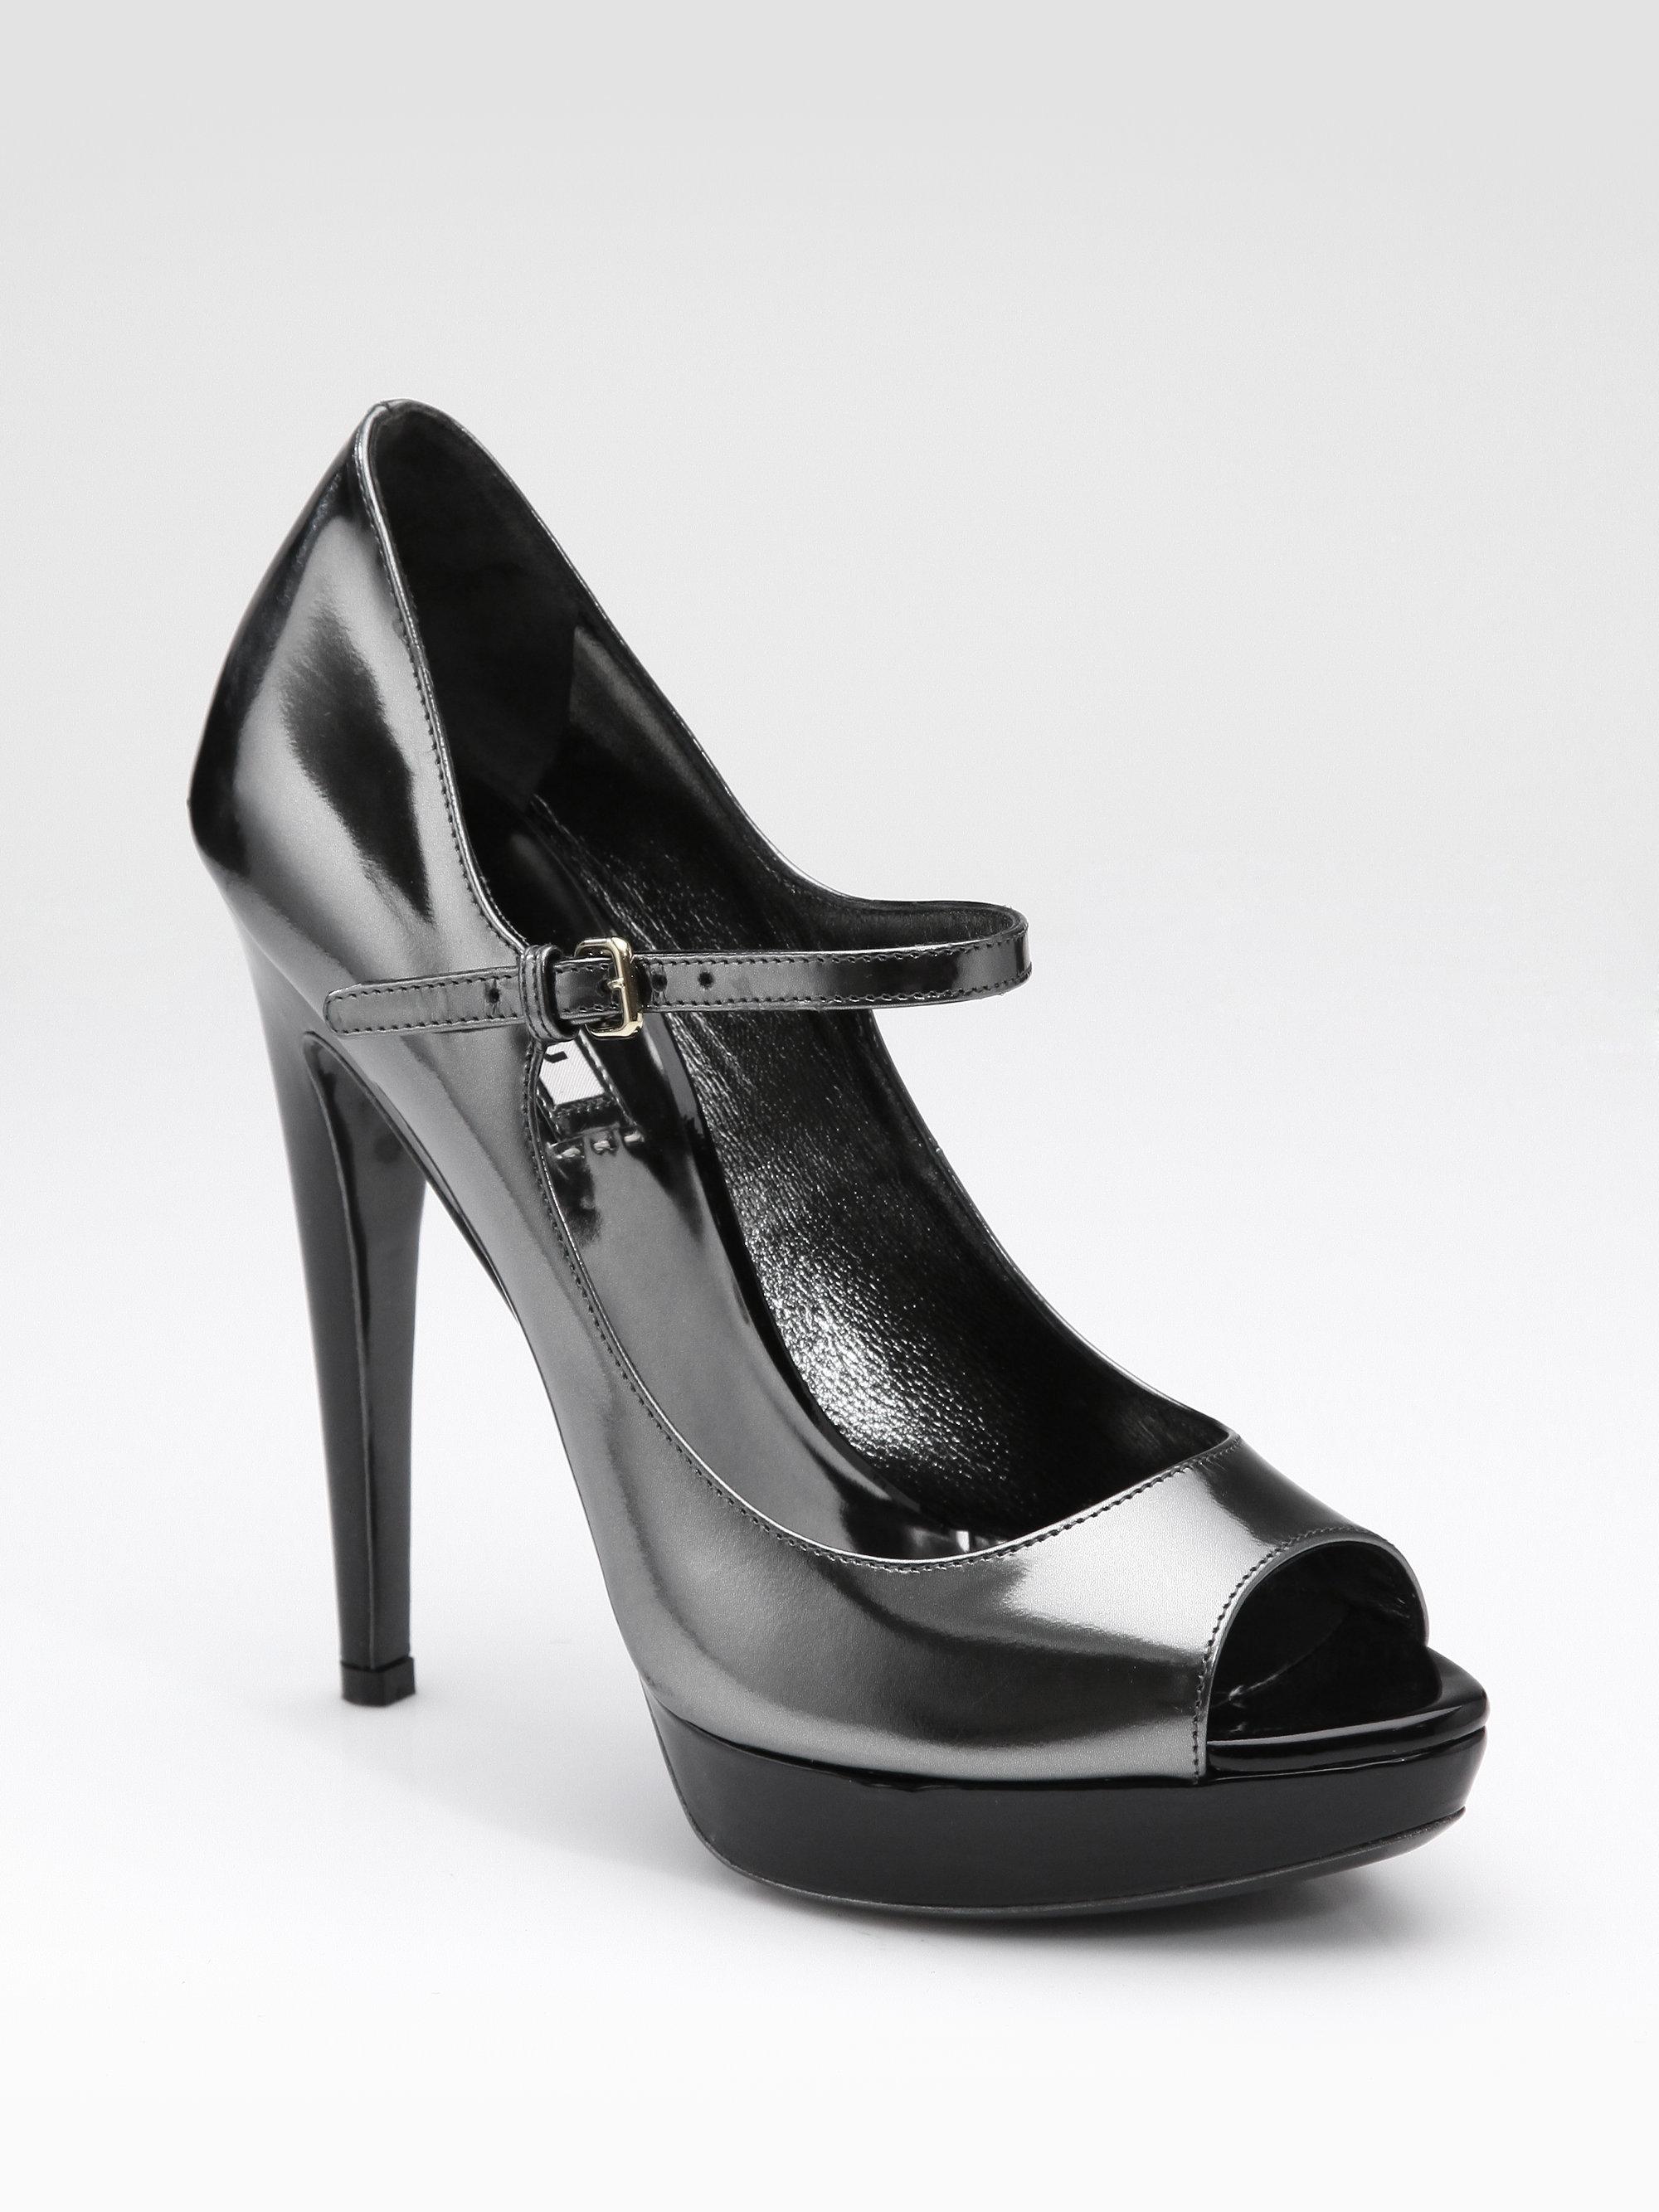 Miu Miu Metallic Patent Mary Jane Pumps in Black (pewter)   Lyst